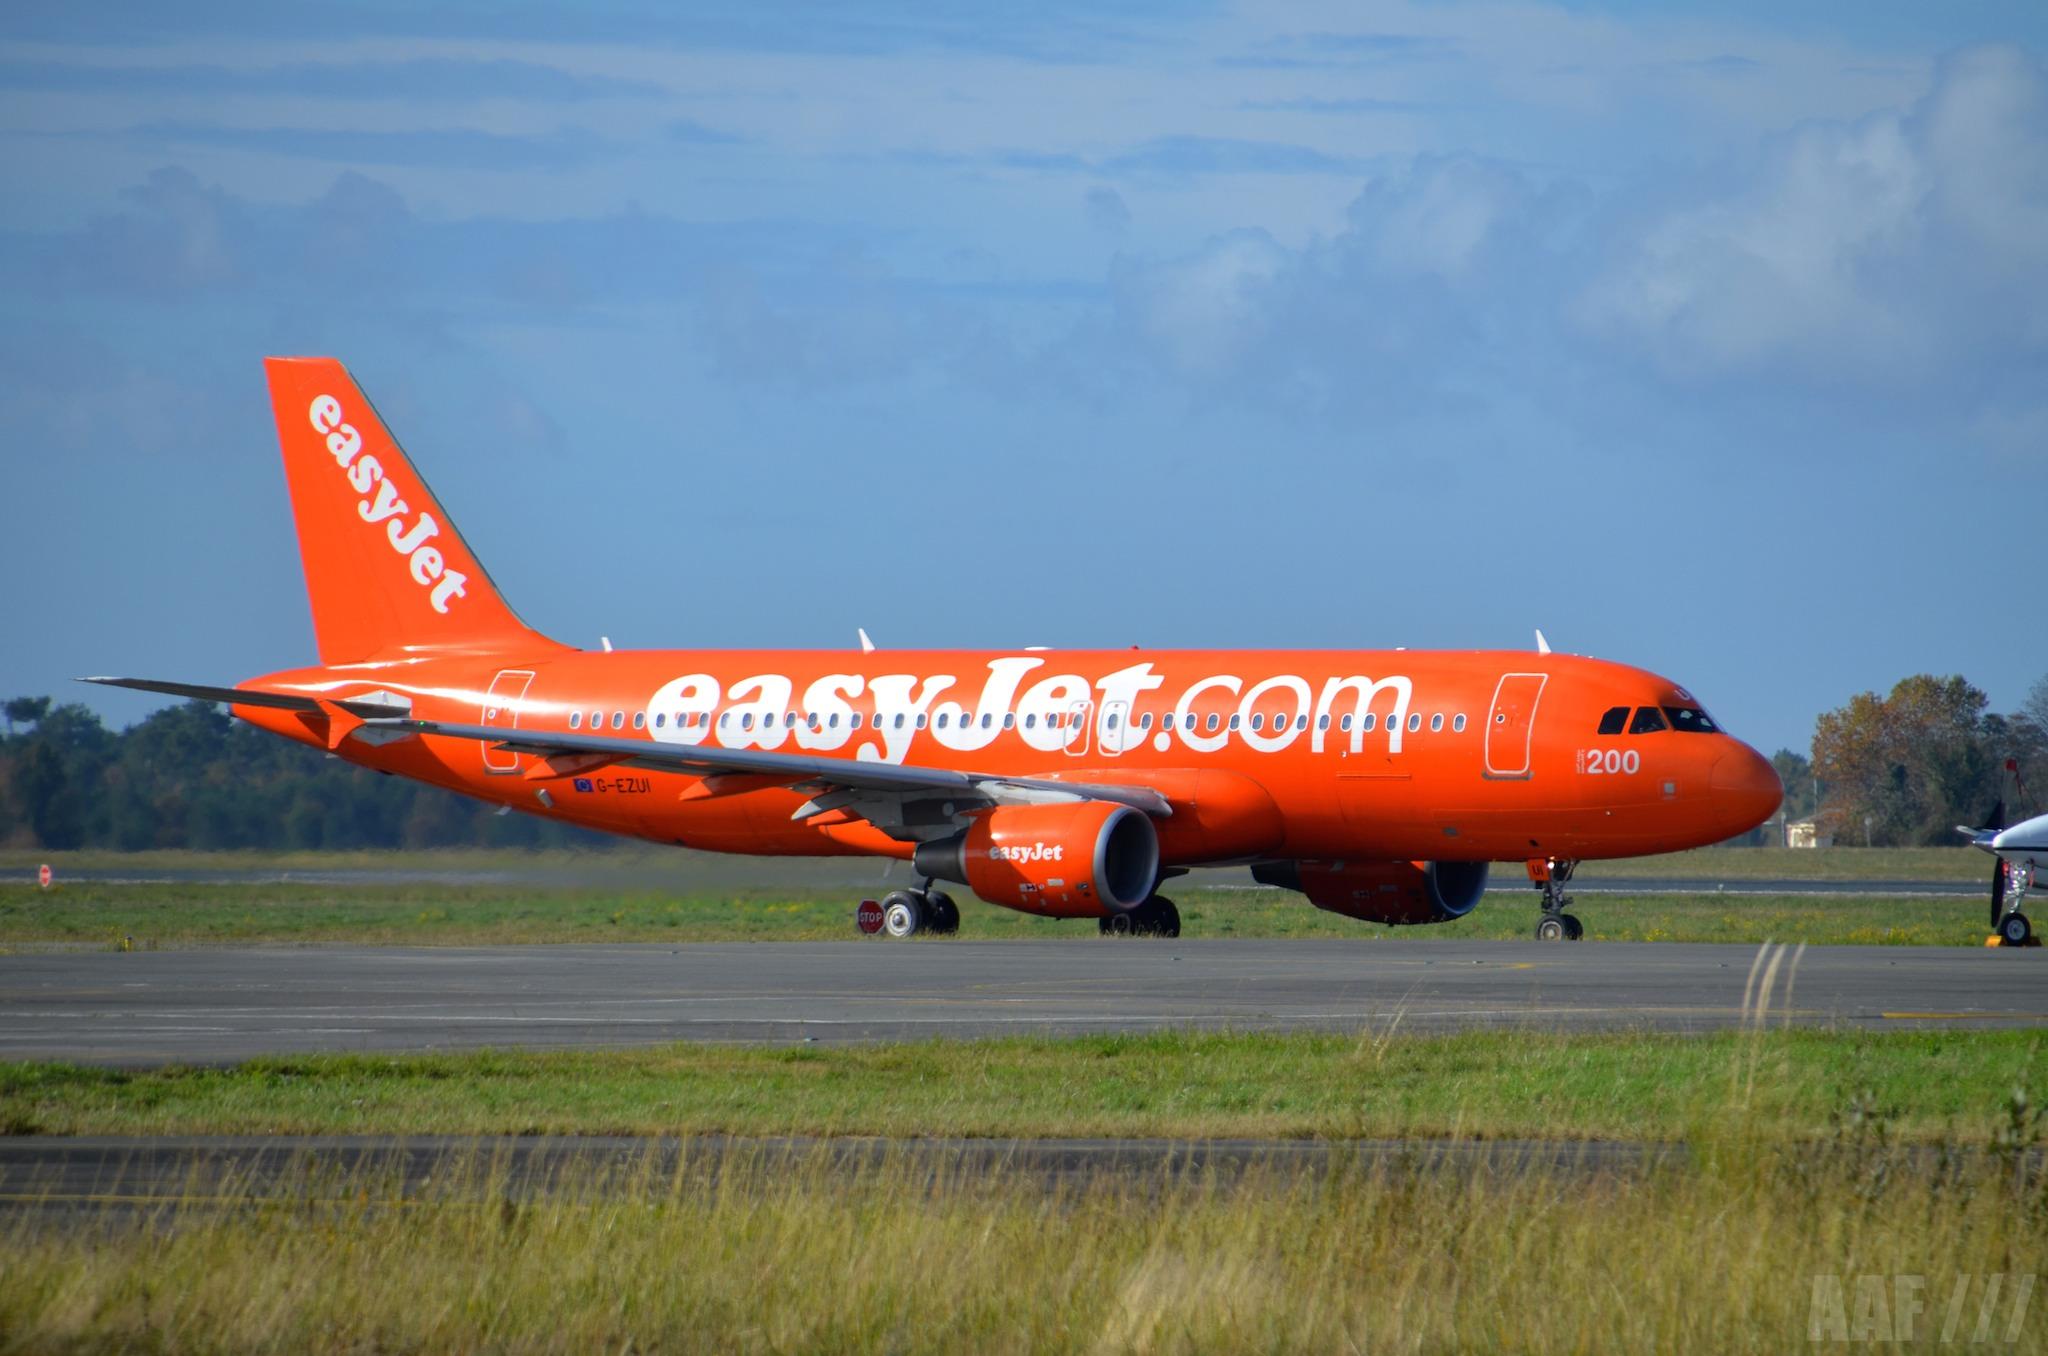 easyJet - (c) AAF_Aviation